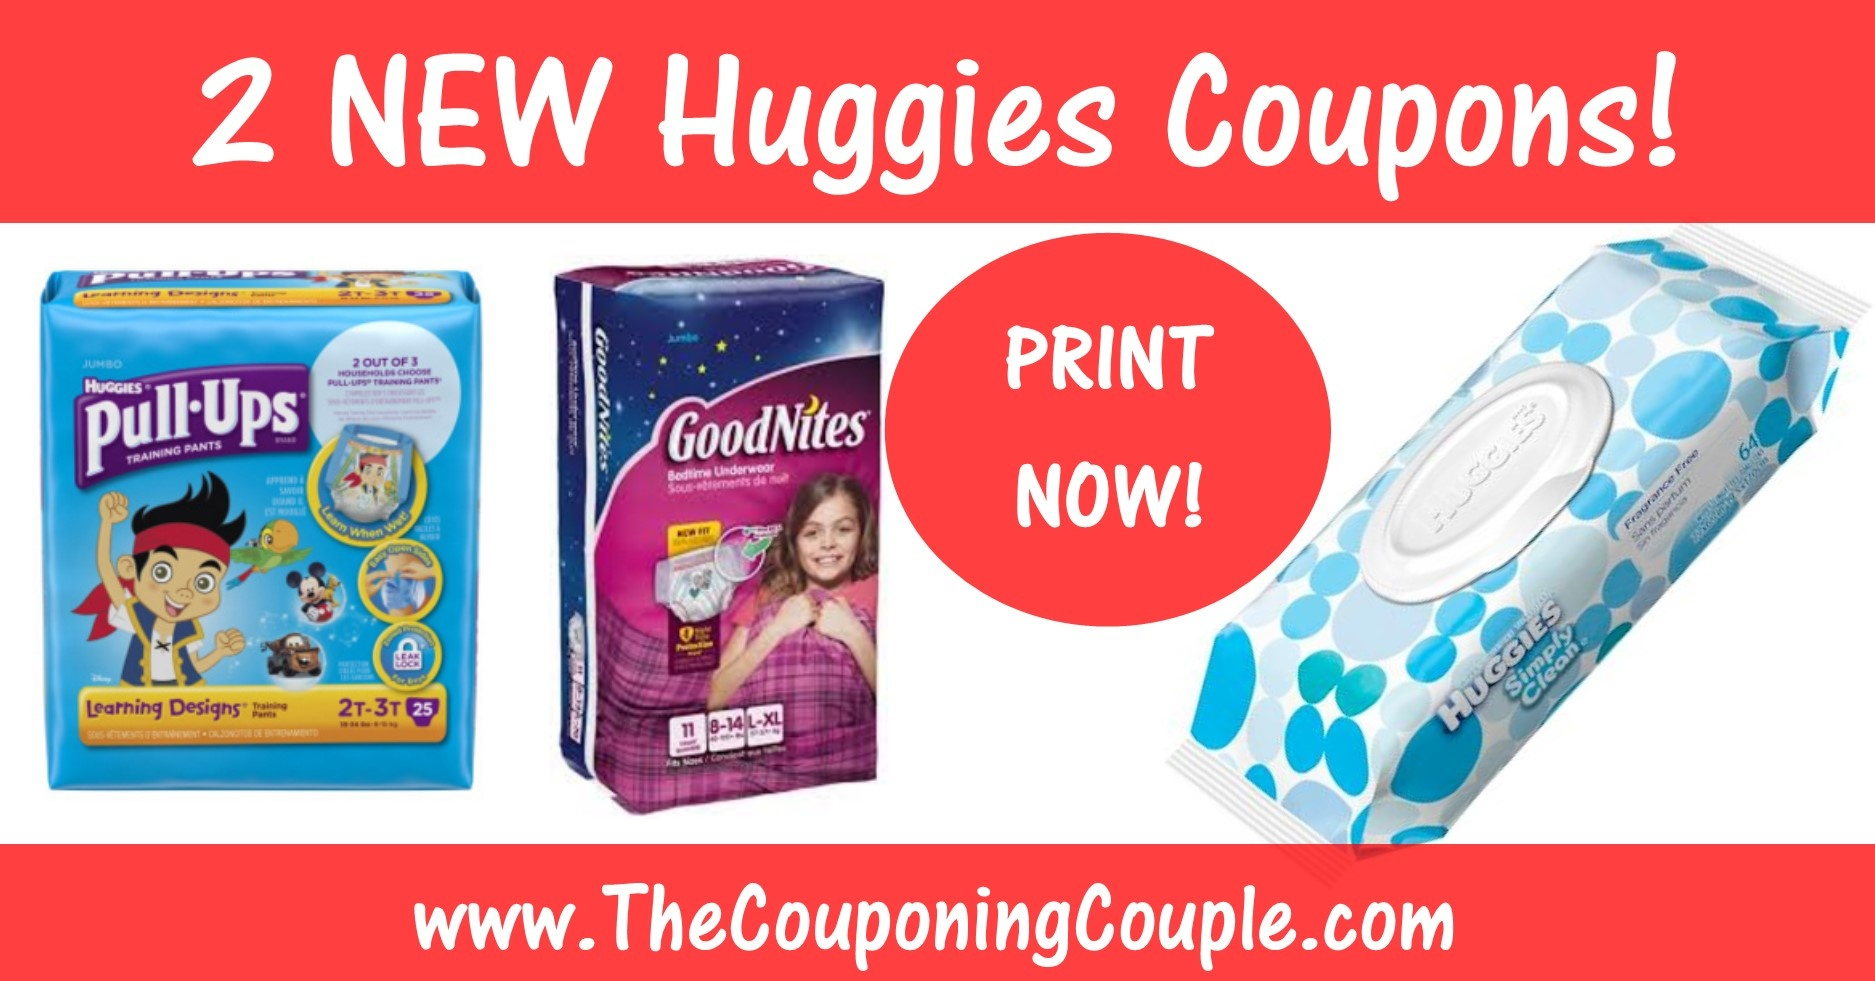 Huggies Wipes Printable Coupon + Pull-Ups & Goodnites Printable Coupon - Free Printable Coupons For Huggies Pull Ups